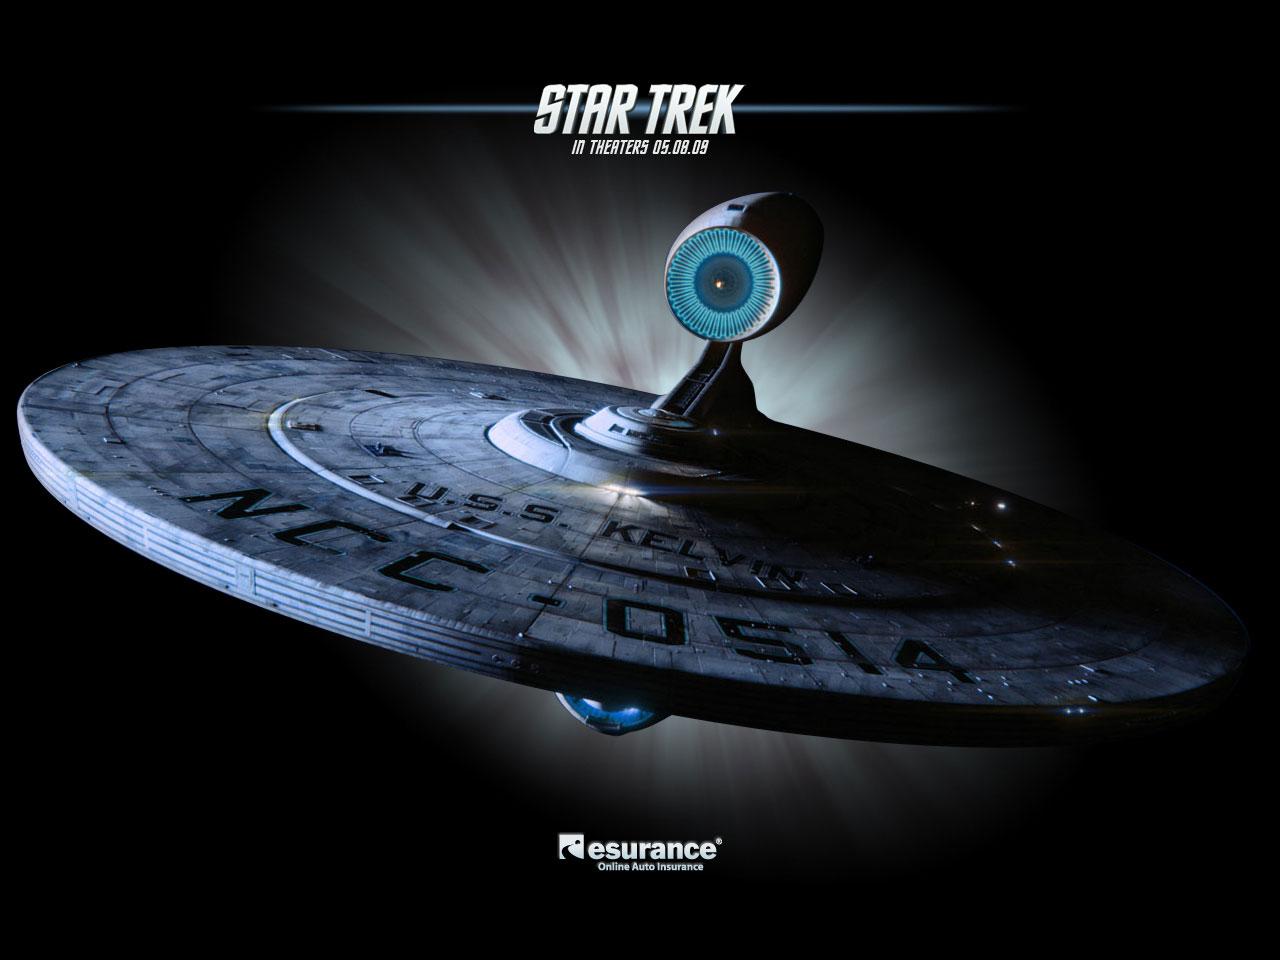 1280x960 Star Trek 2009 Movie Wallpapers JoBlocom 1280x960